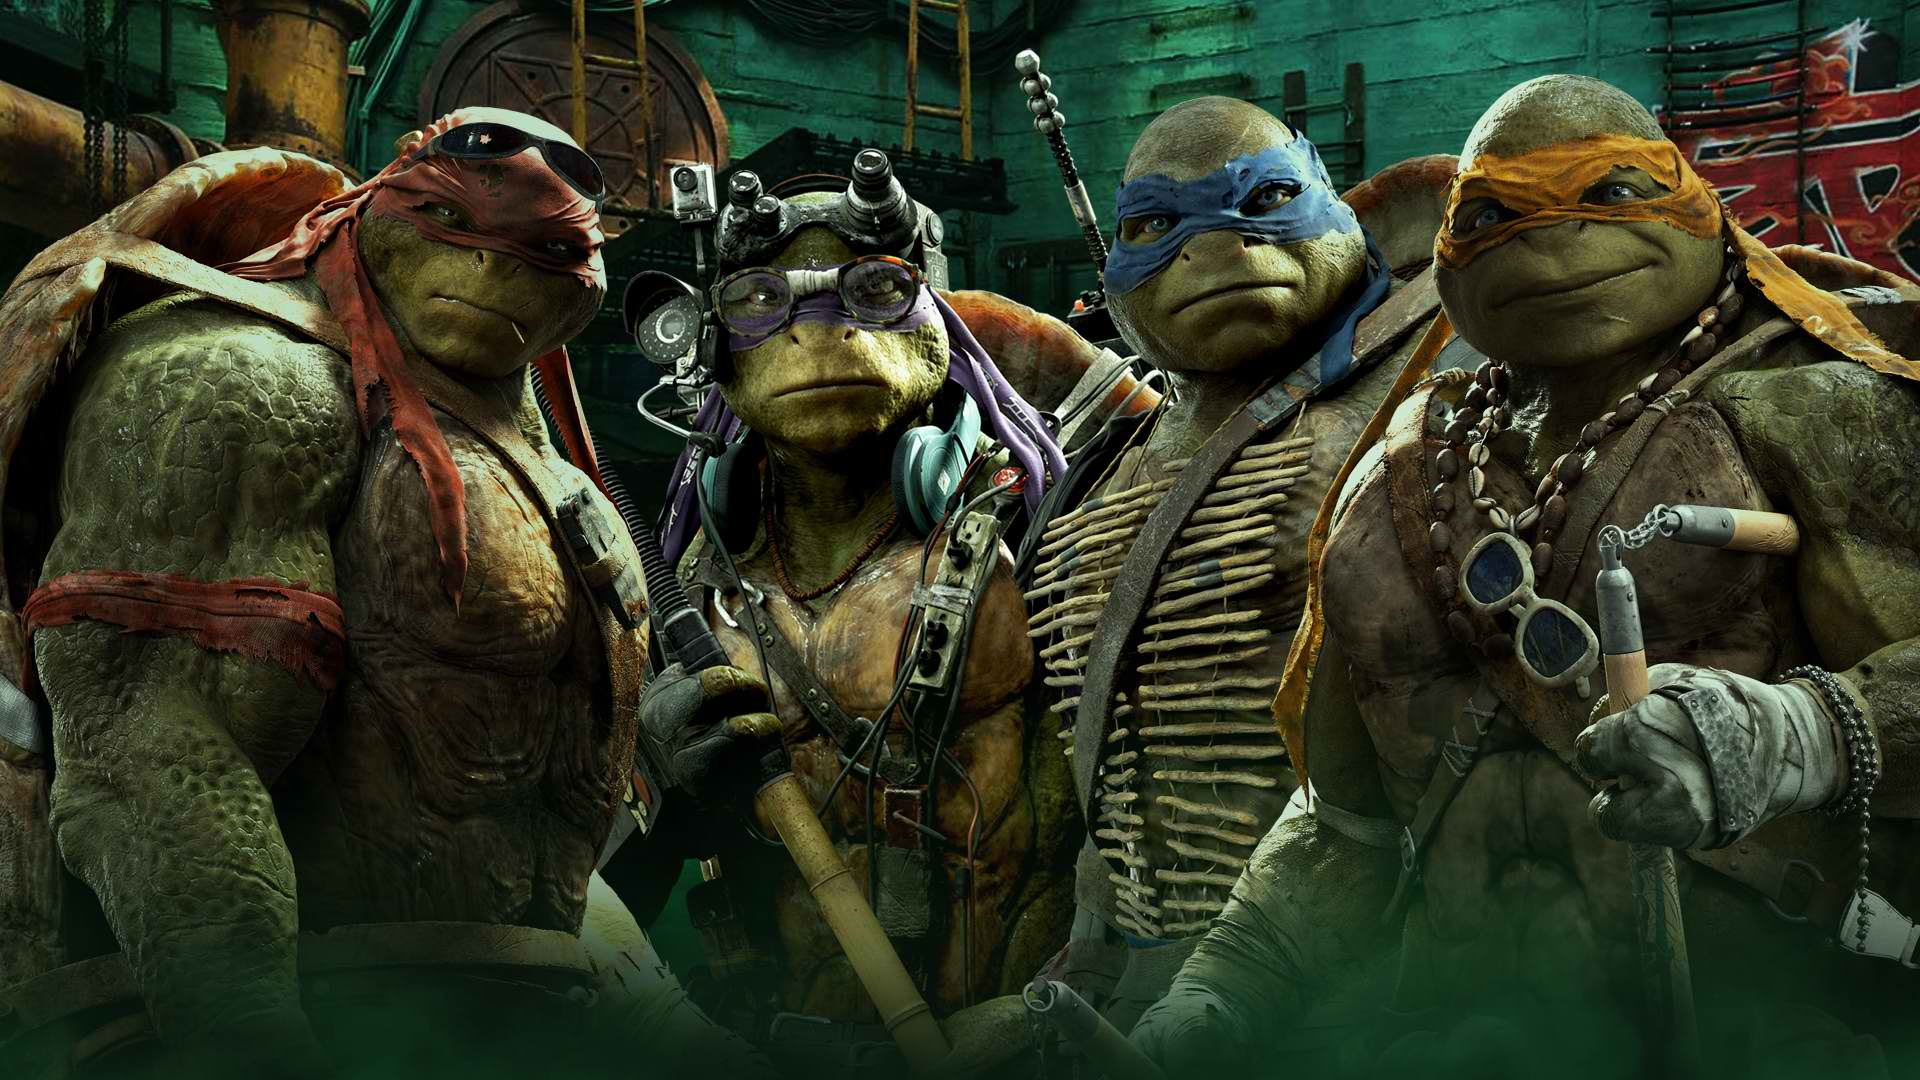 Teenage Mutant Ninja Turtles Wallpapers Wallpaper